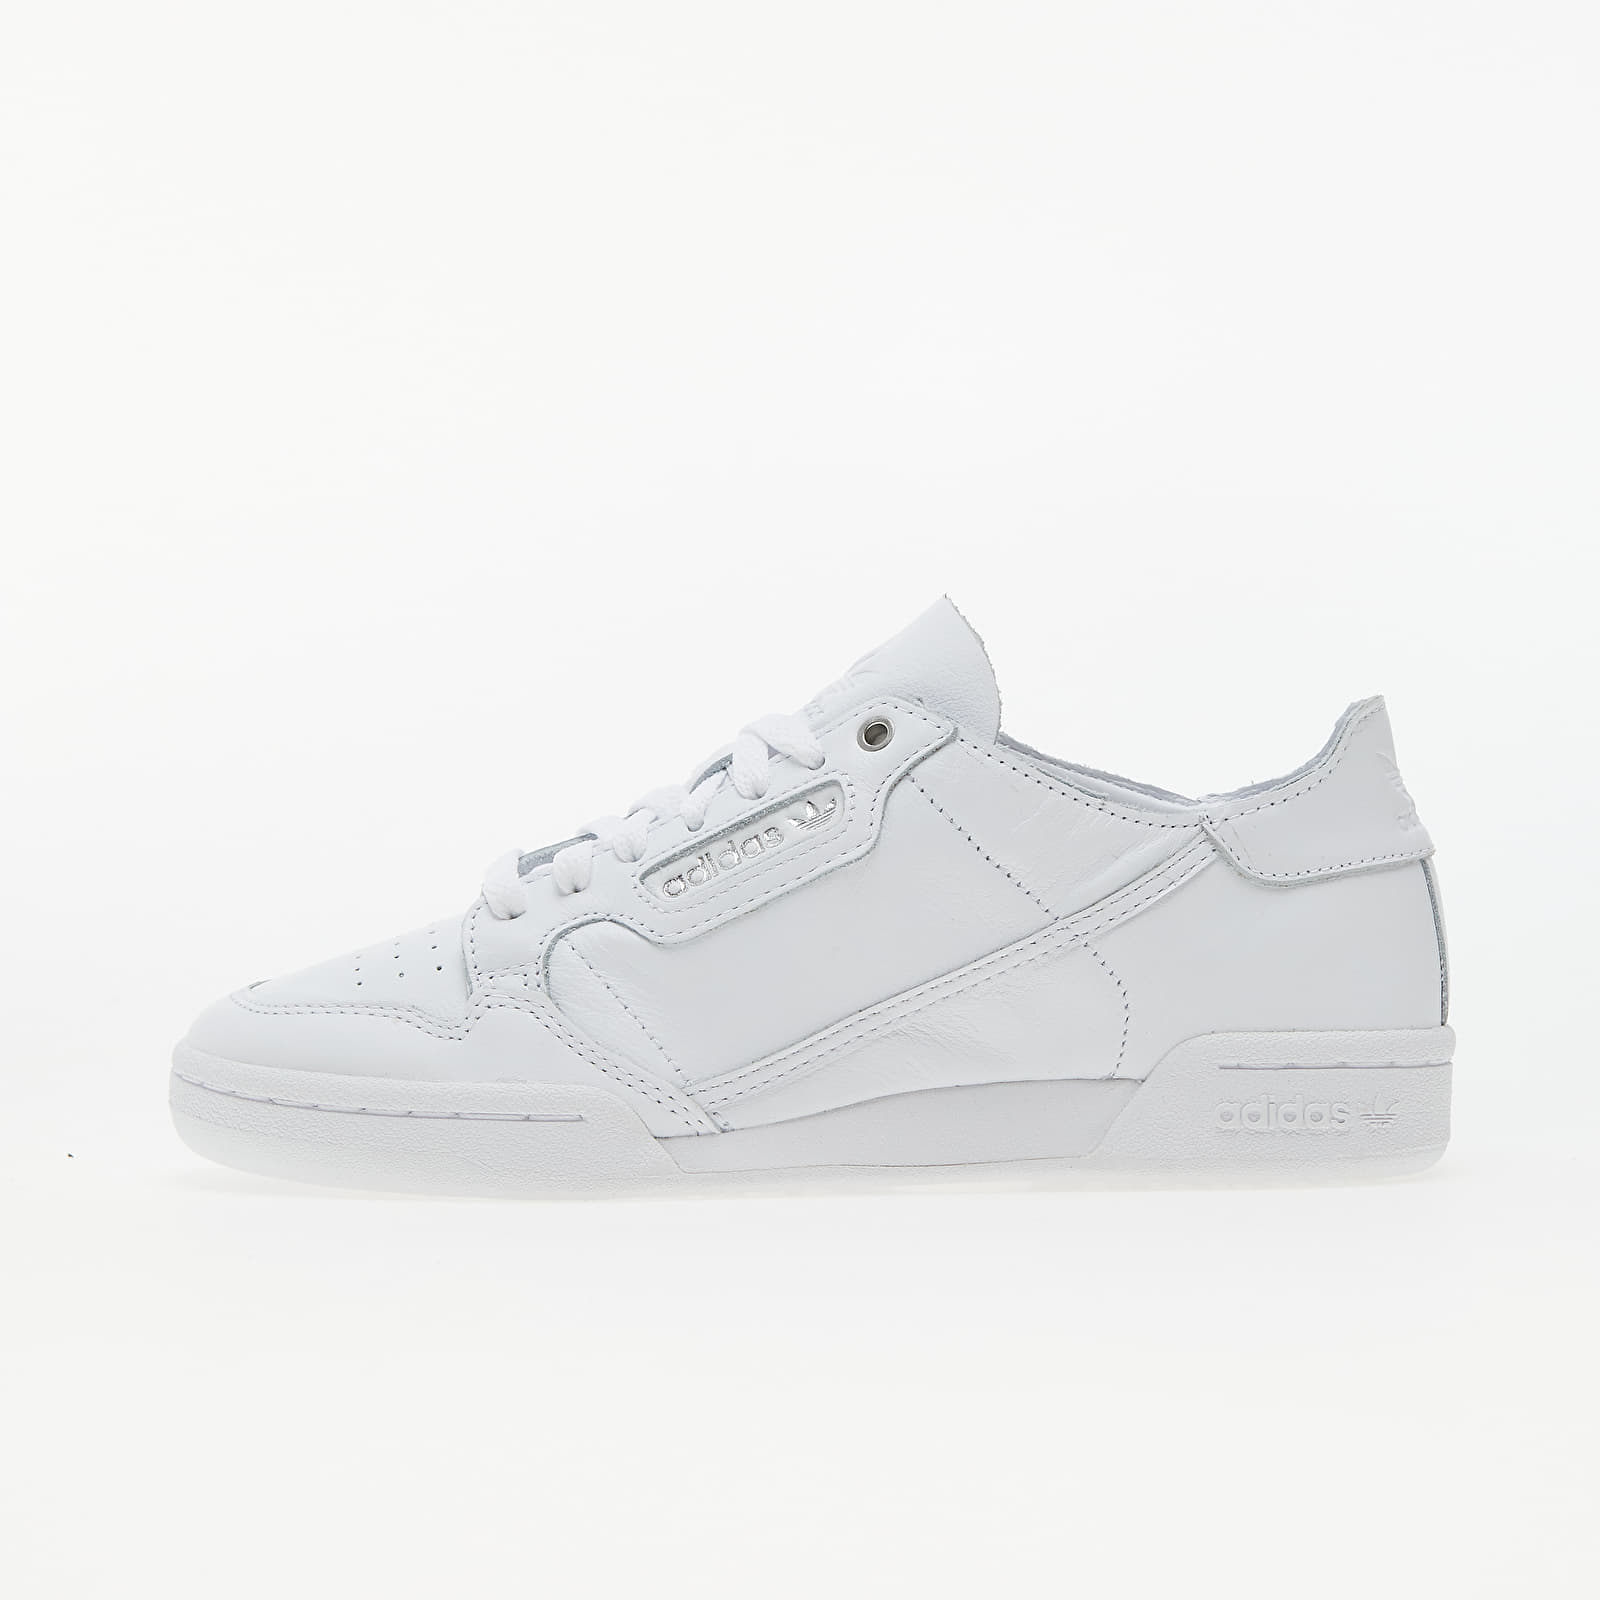 adidas Continental 80 Recon Ftw White/ Ftw White/ Silver Metalic FX5407